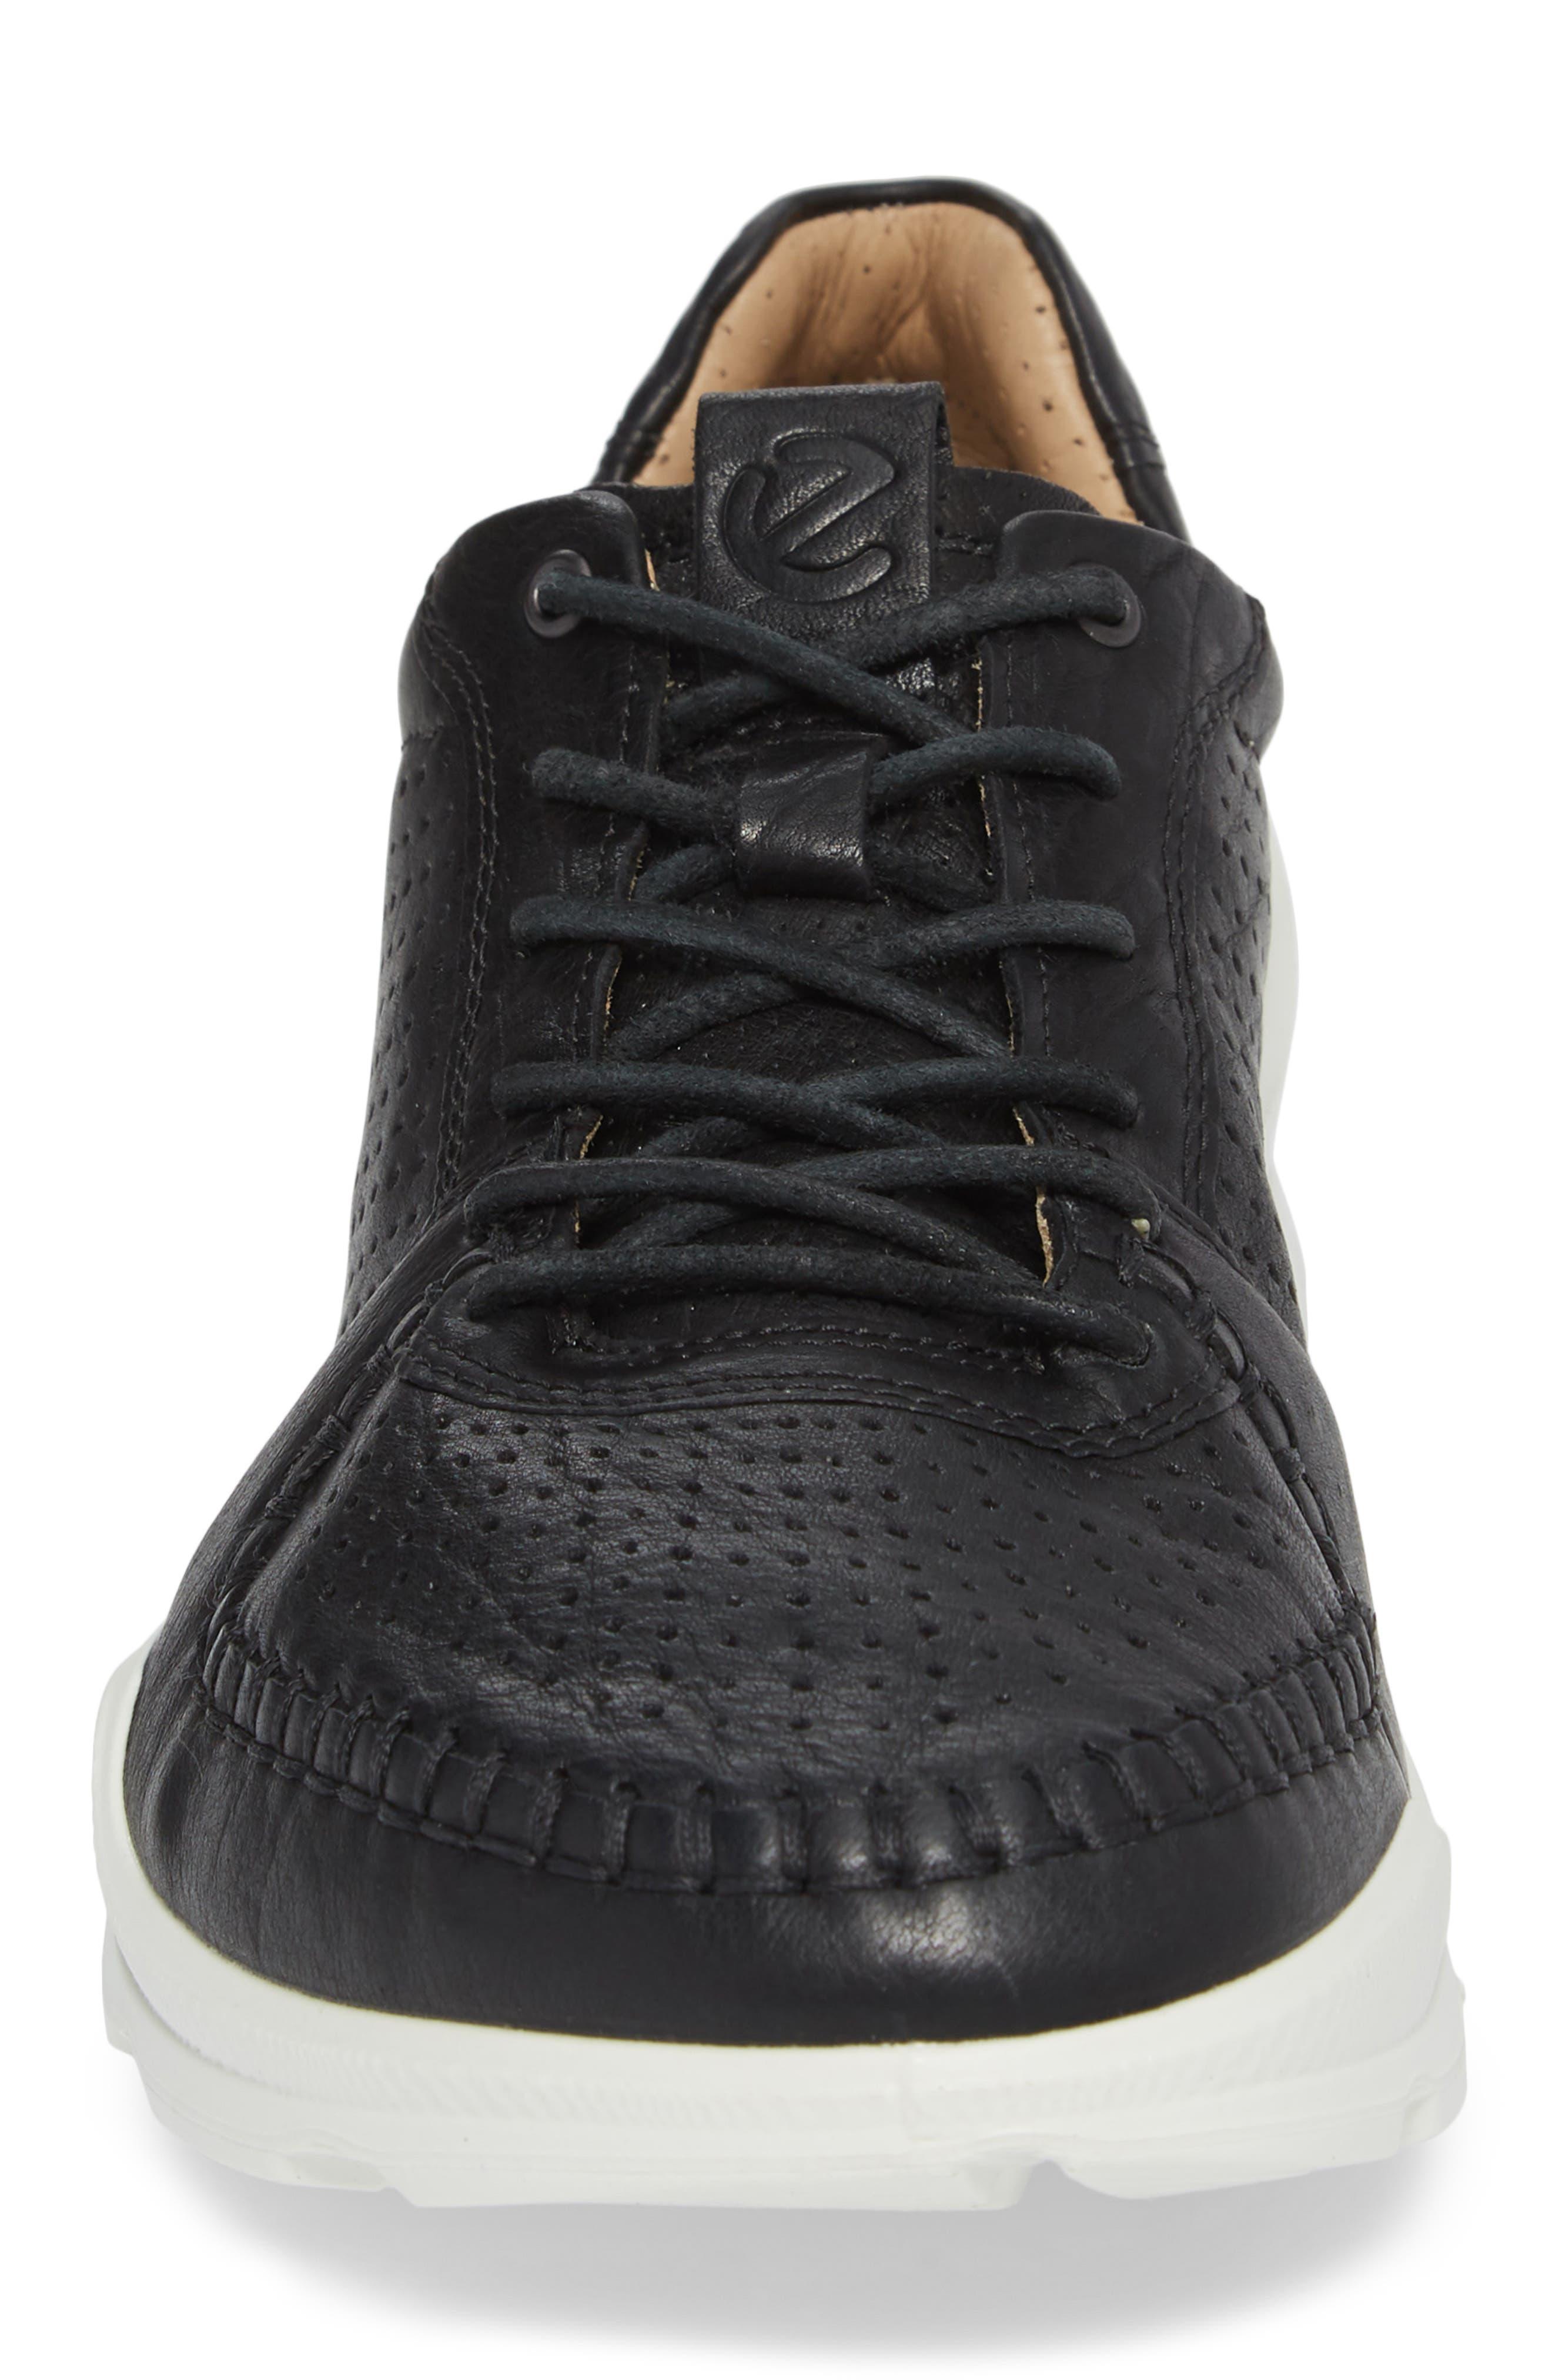 BIOM Street Moc Toe Sneaker,                             Alternate thumbnail 4, color,                             Black Leather